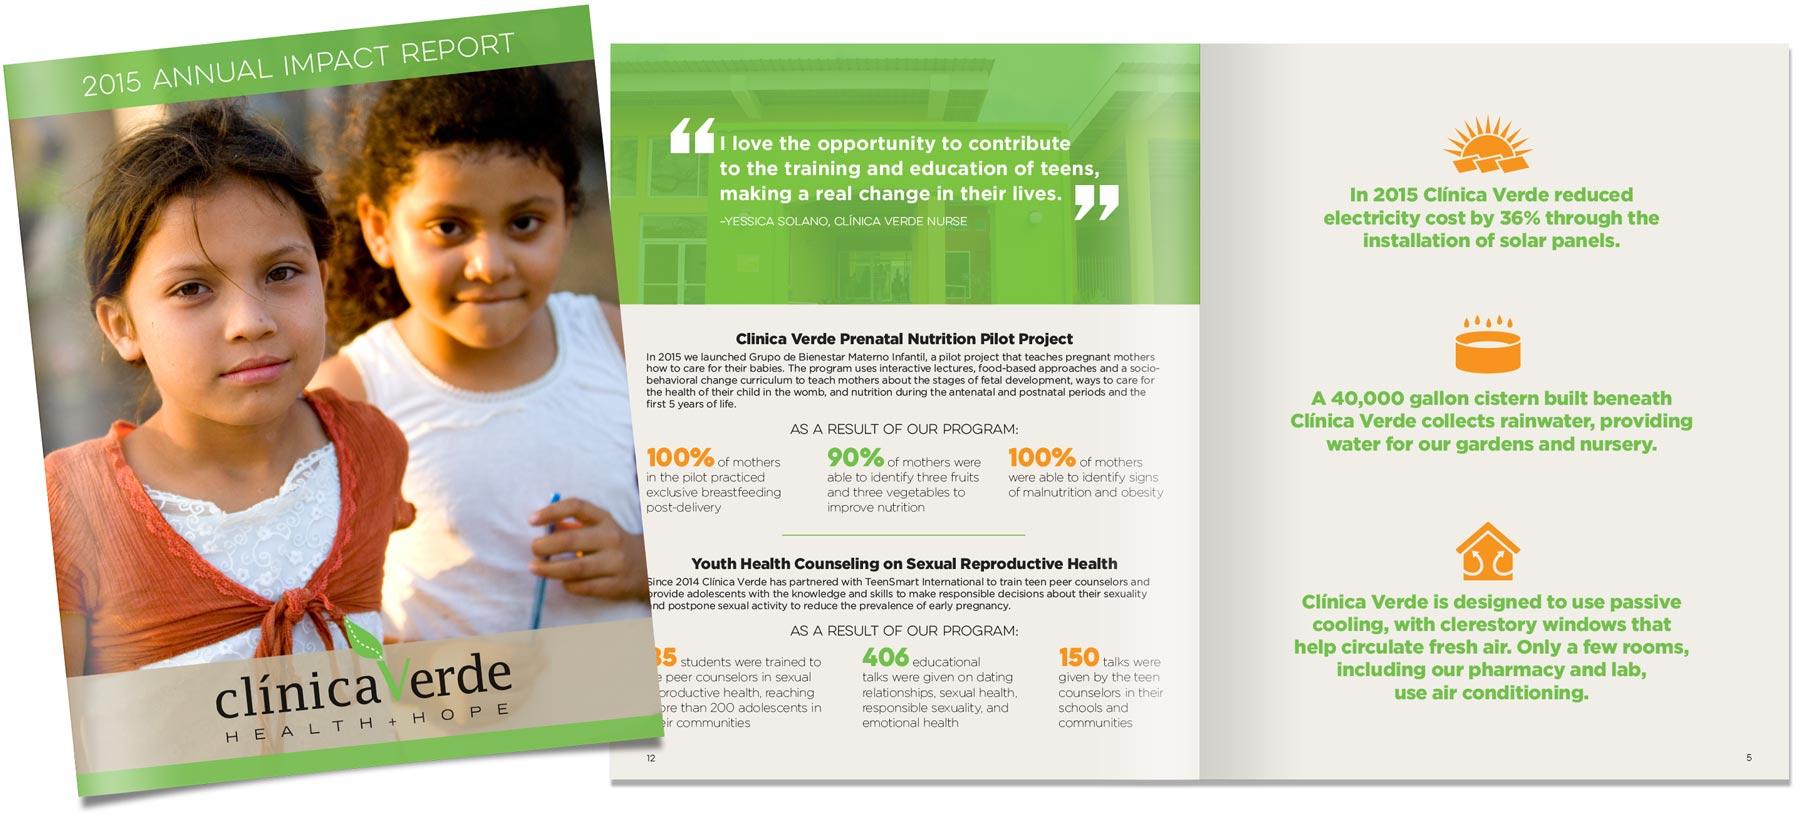 todd_bates_creative_corporate-report_design